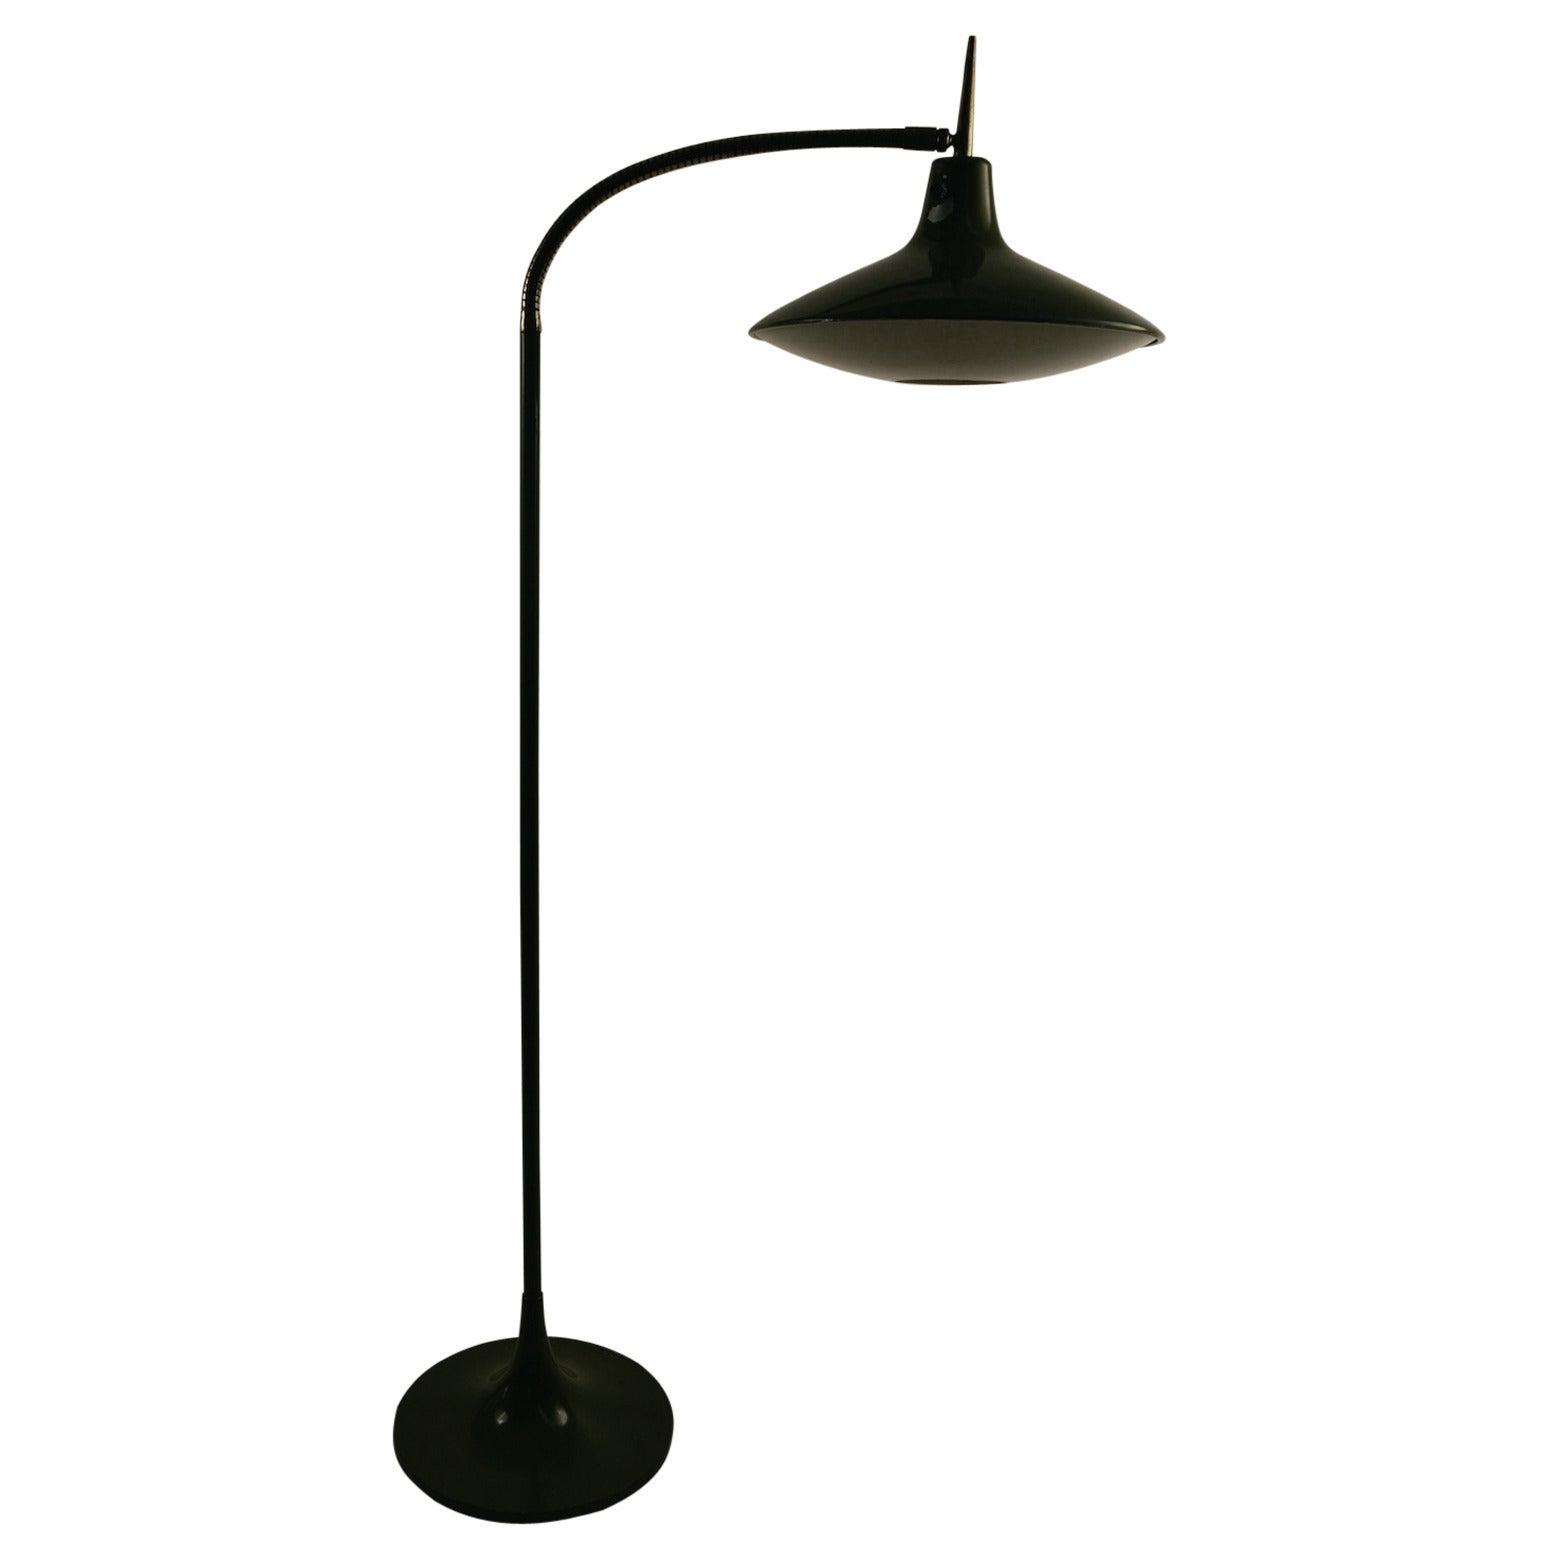 Laurel Gooseneck Floor Lamp Model B- 683 in the style of Ponti